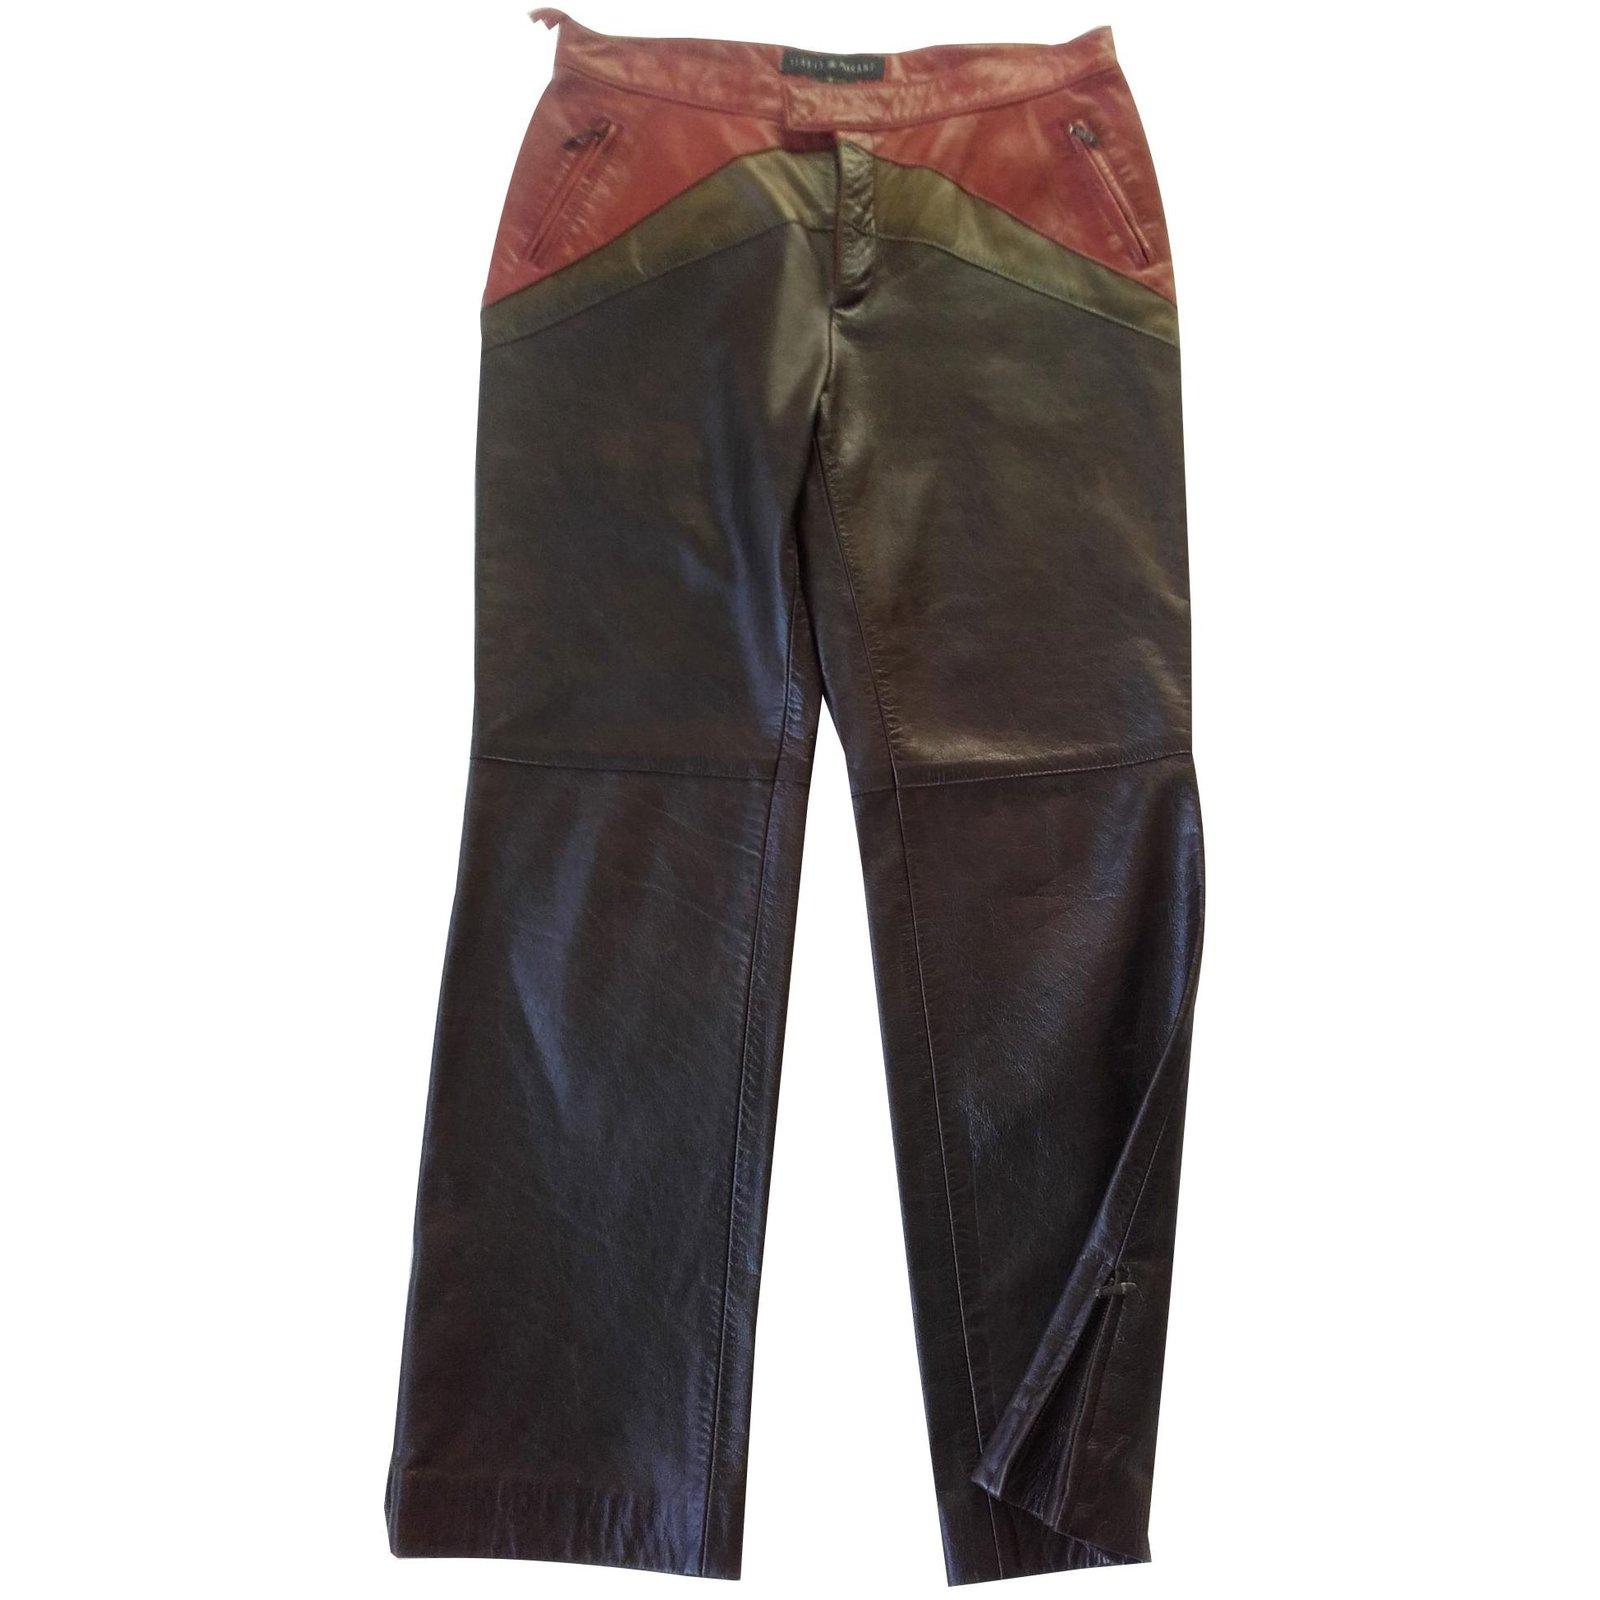 Pantalons Marant Joli Marron Cuir 86717 Isabel Pantalon Etoile Ref v80mnwN